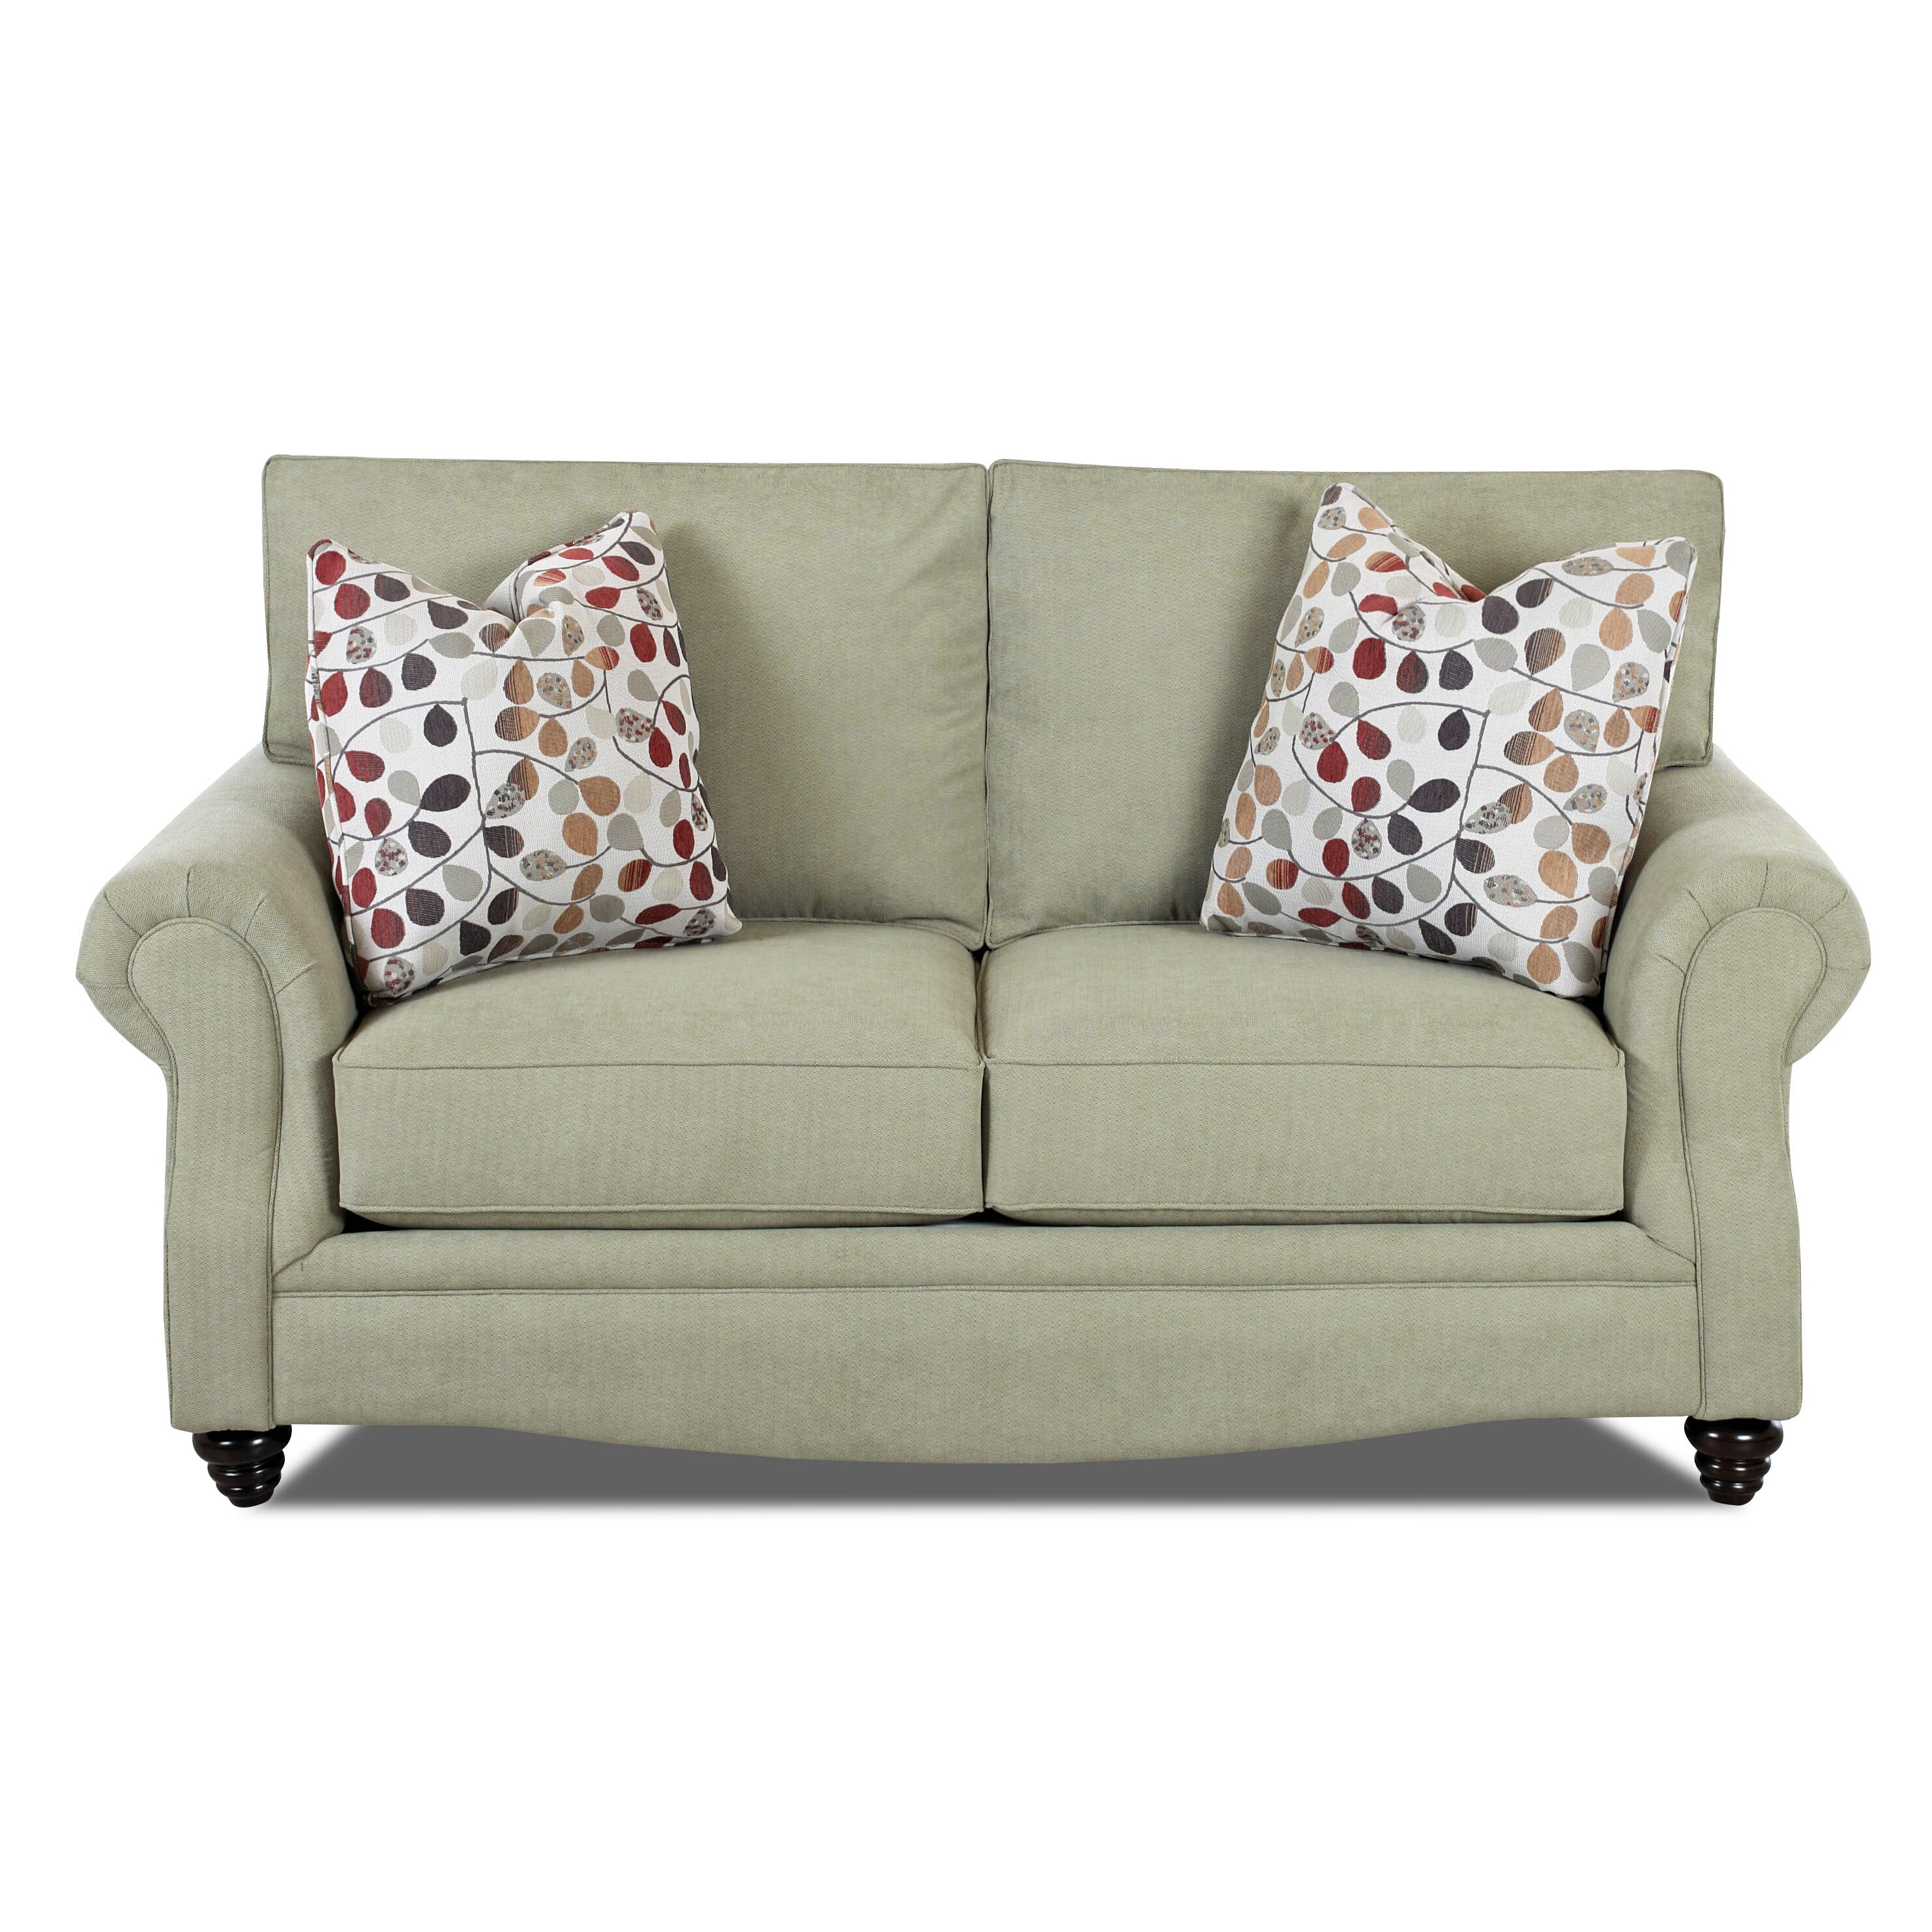 Klaussner furniture raymond sofa wayfair for Klaussner sofa